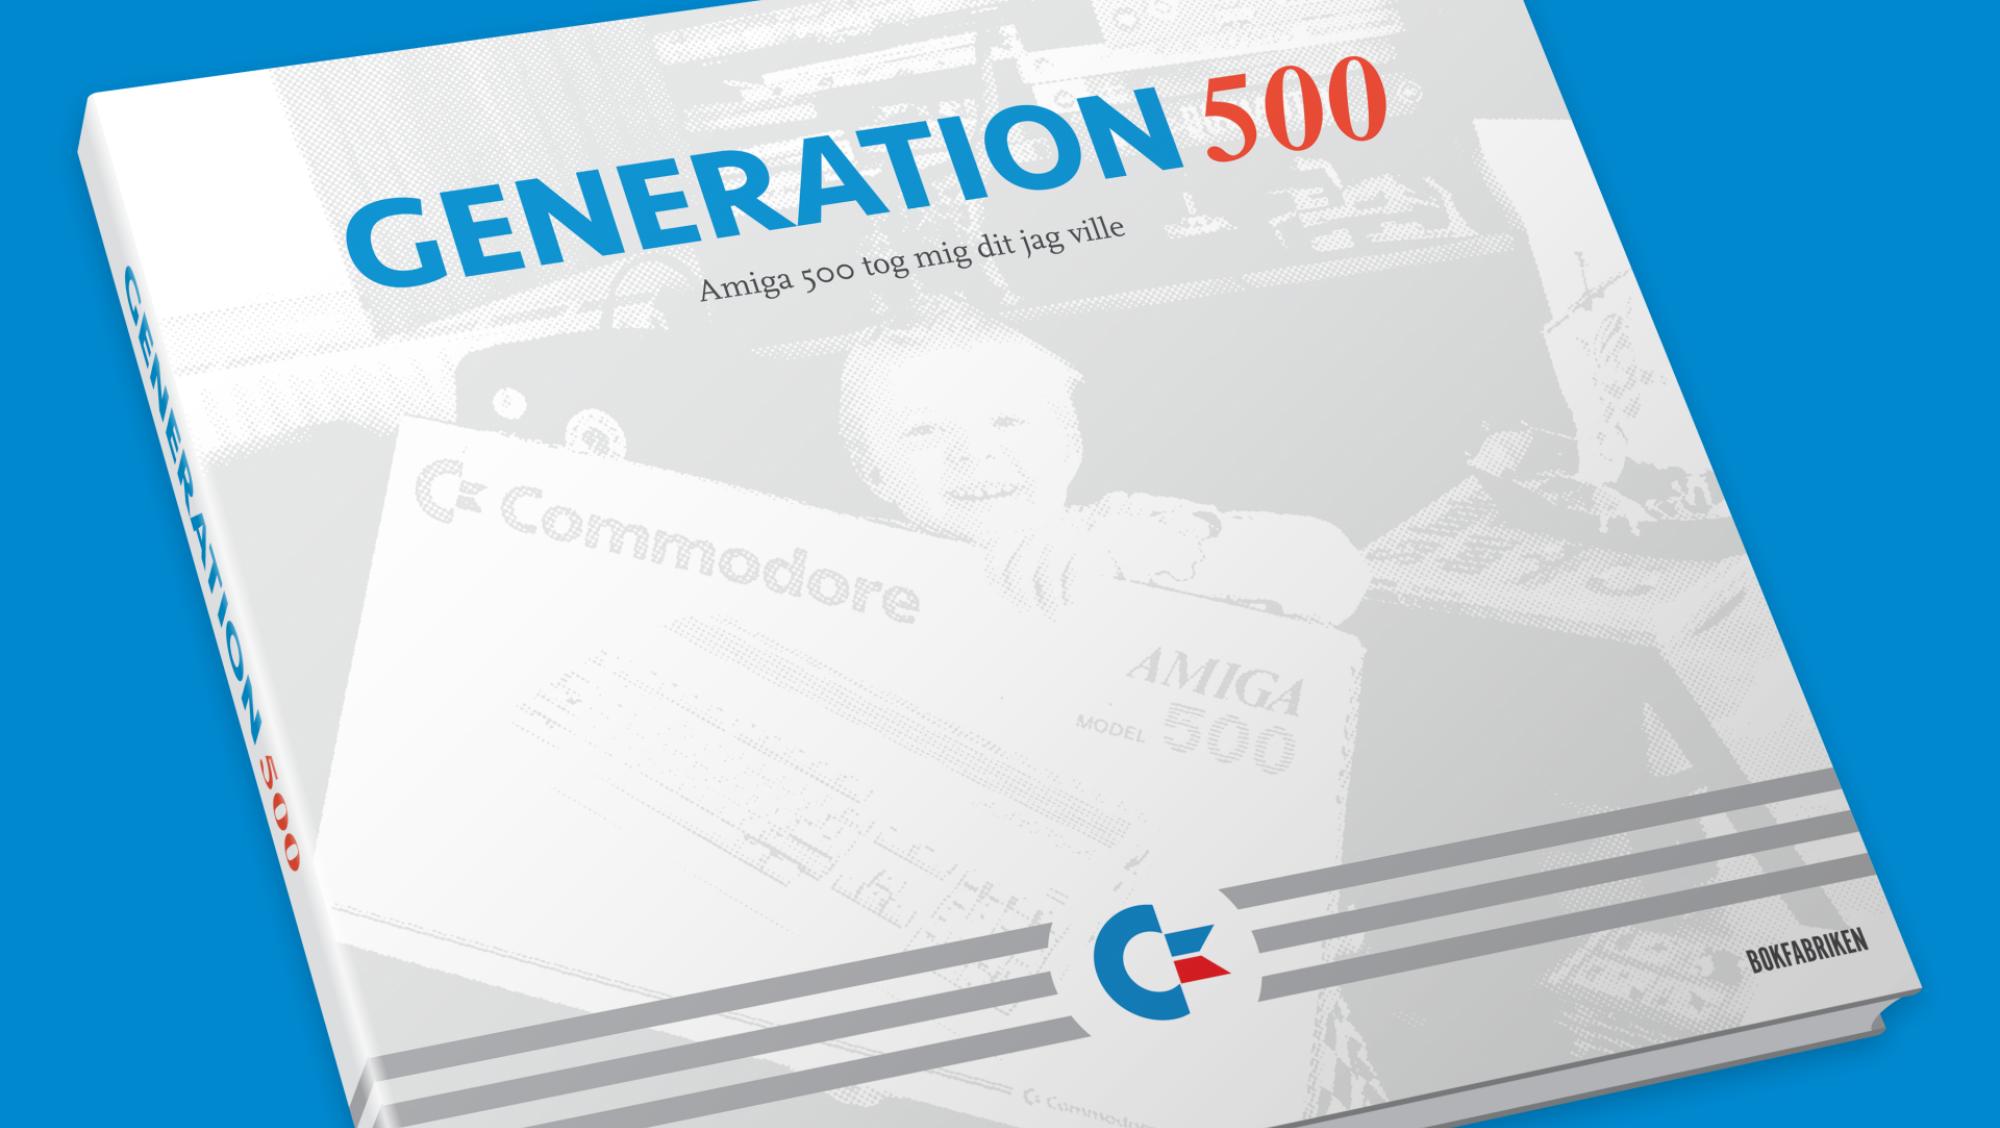 Generation 500: Amiga 500 tog mig dit jag ville